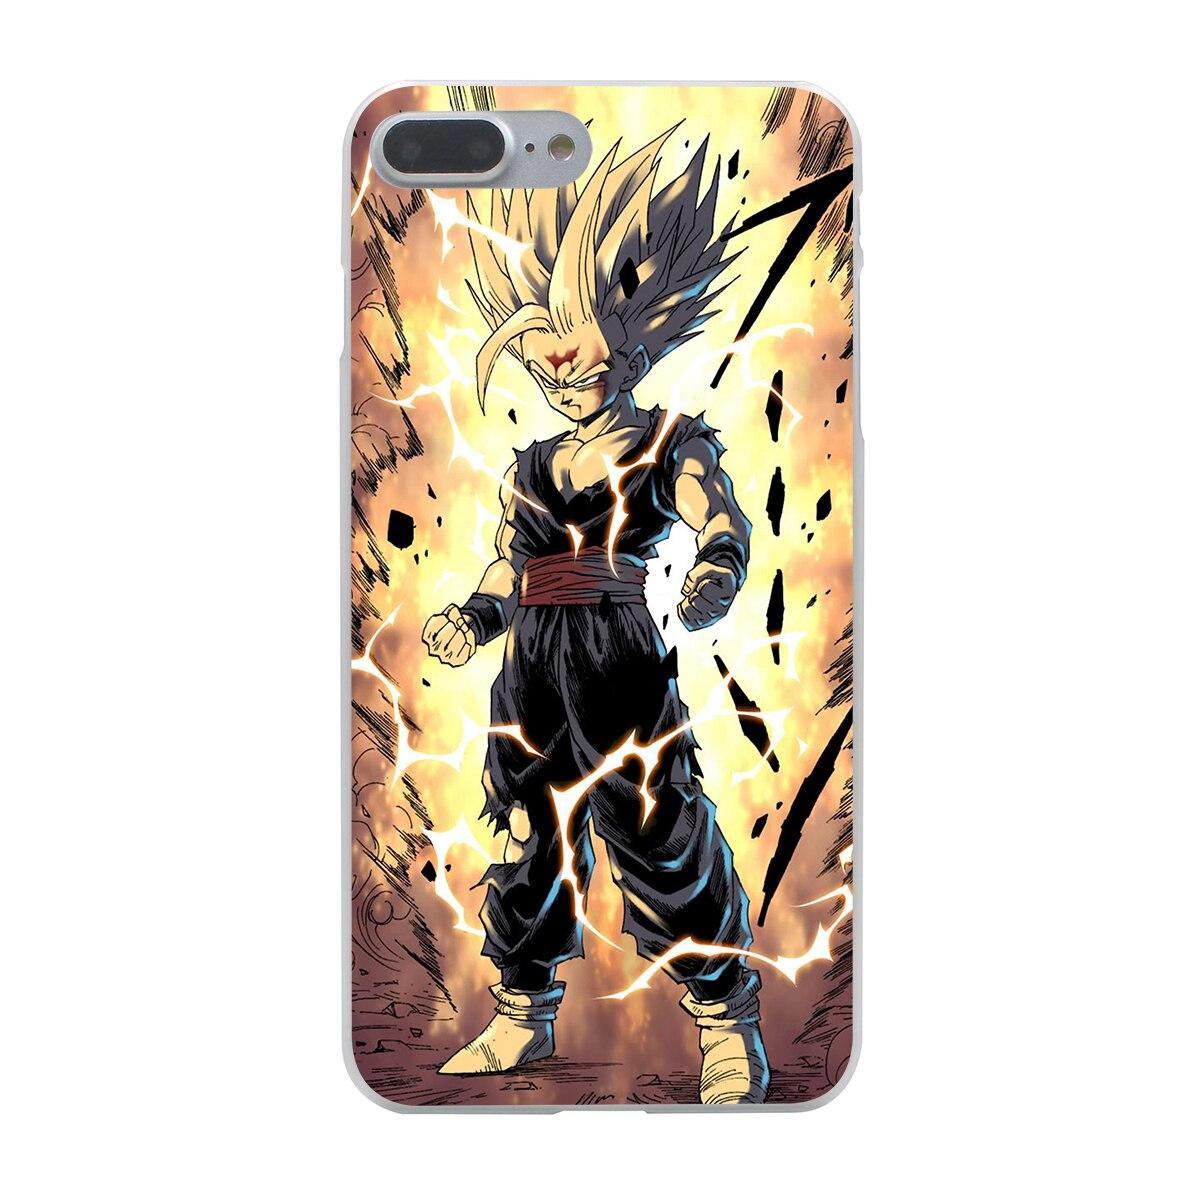 dragon ball z iphone 7 case